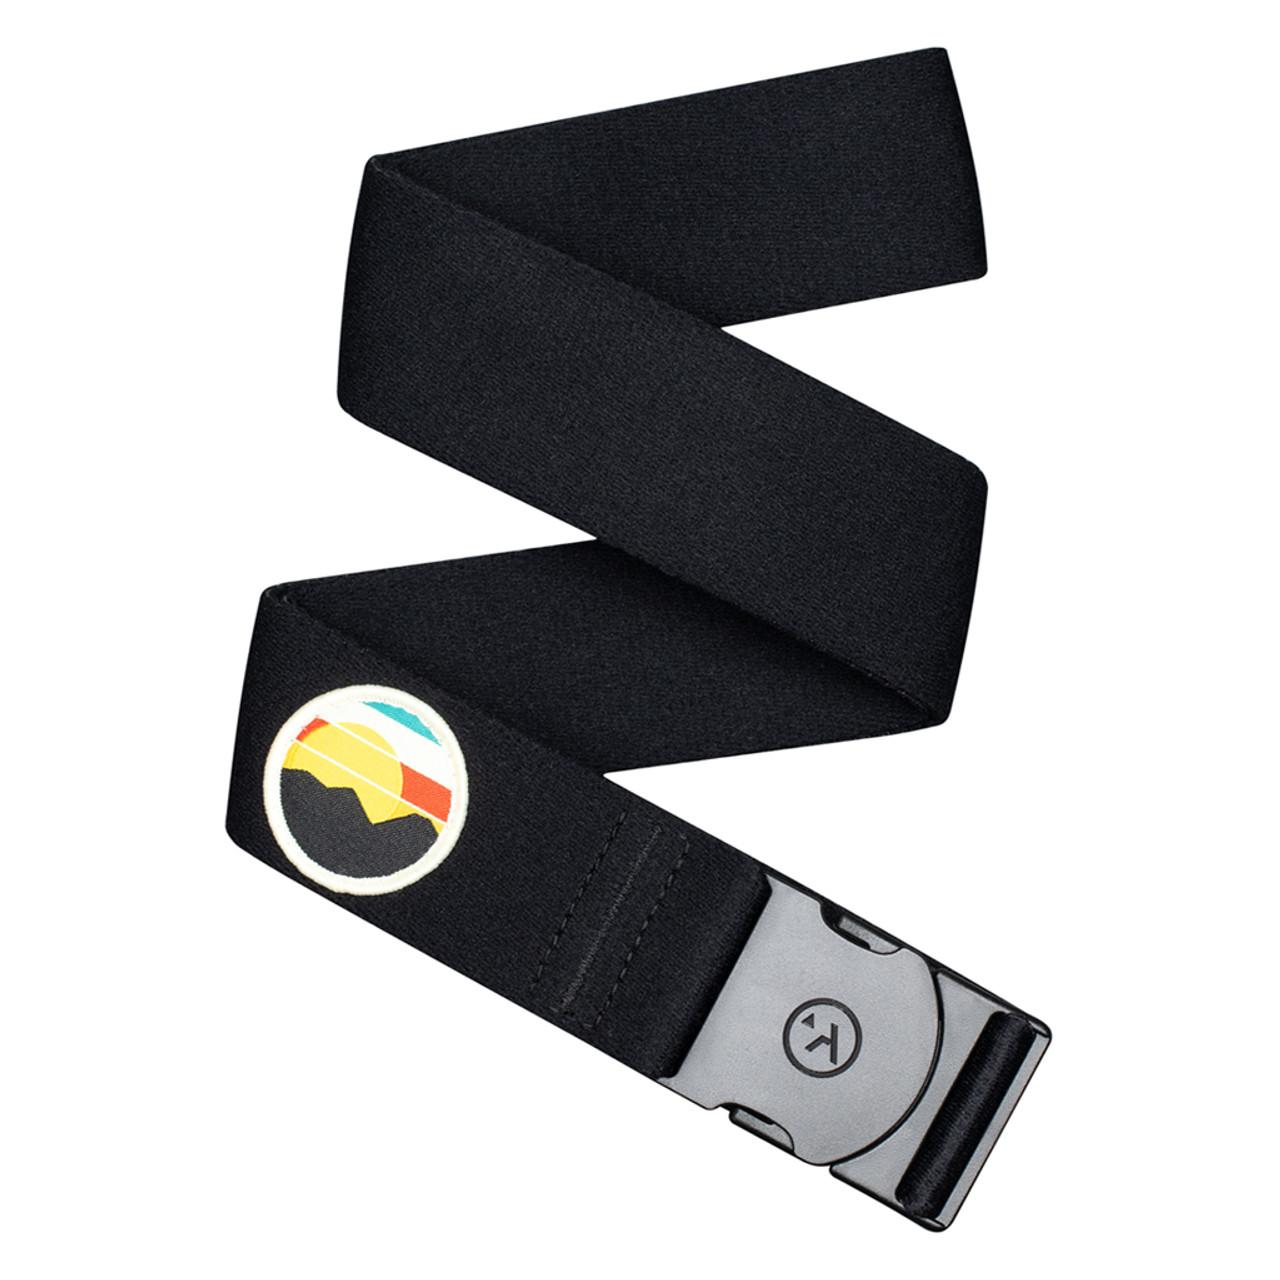 Black/Sunsetter - Arcade Rambler Belt